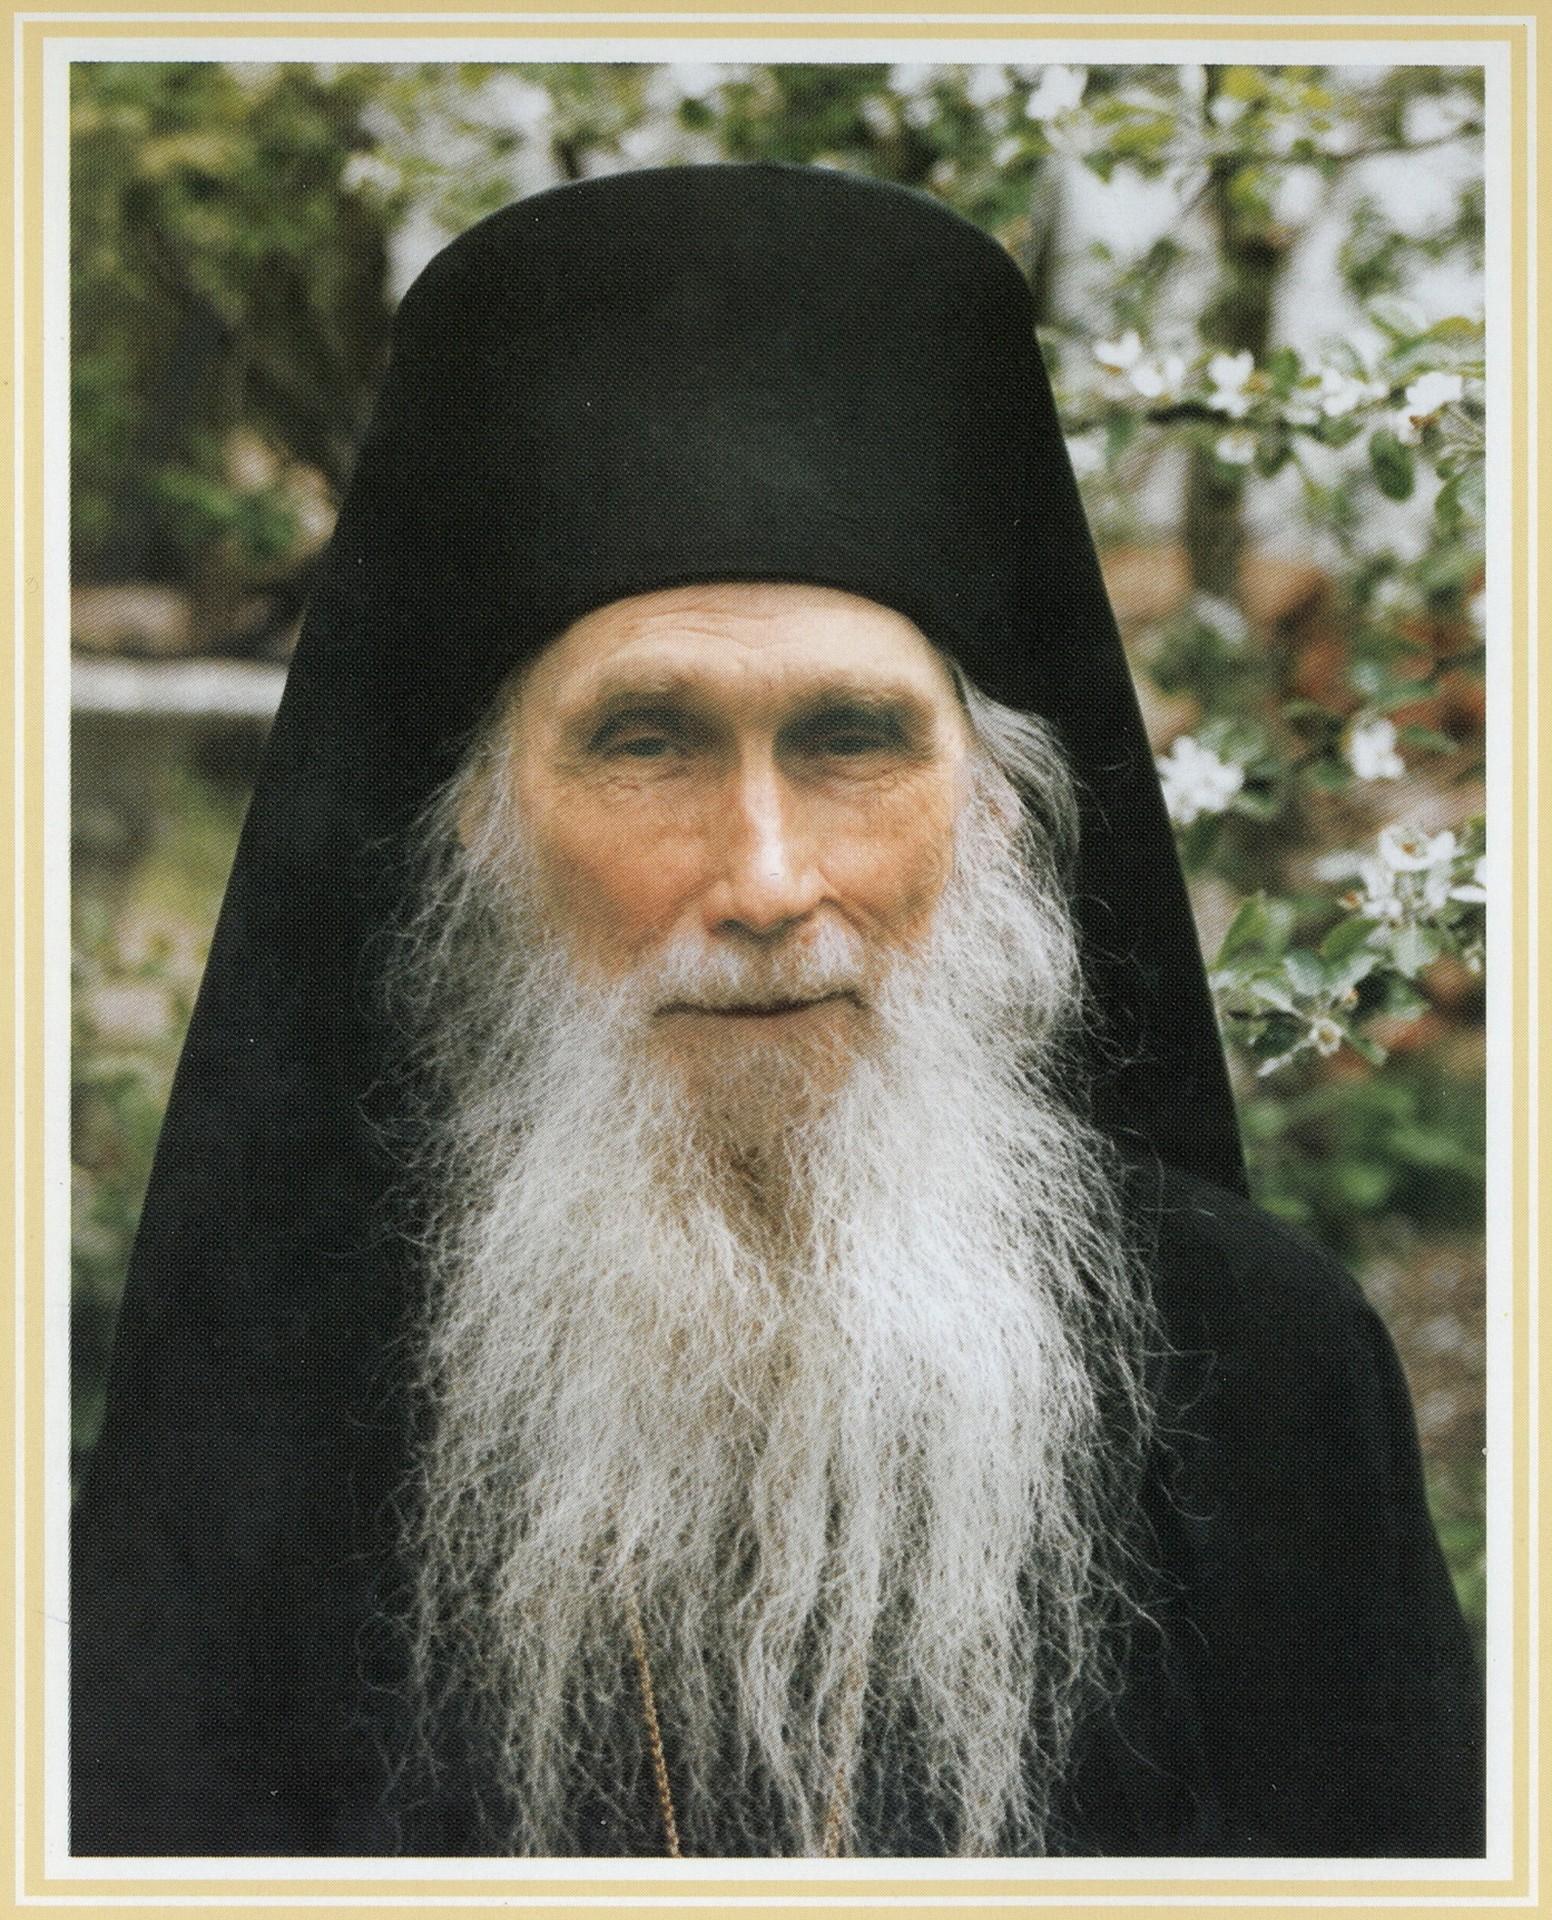 факты Санкт-Петербурге отошел ко господу архимандрит кирилл павлов Хабаровске, получите